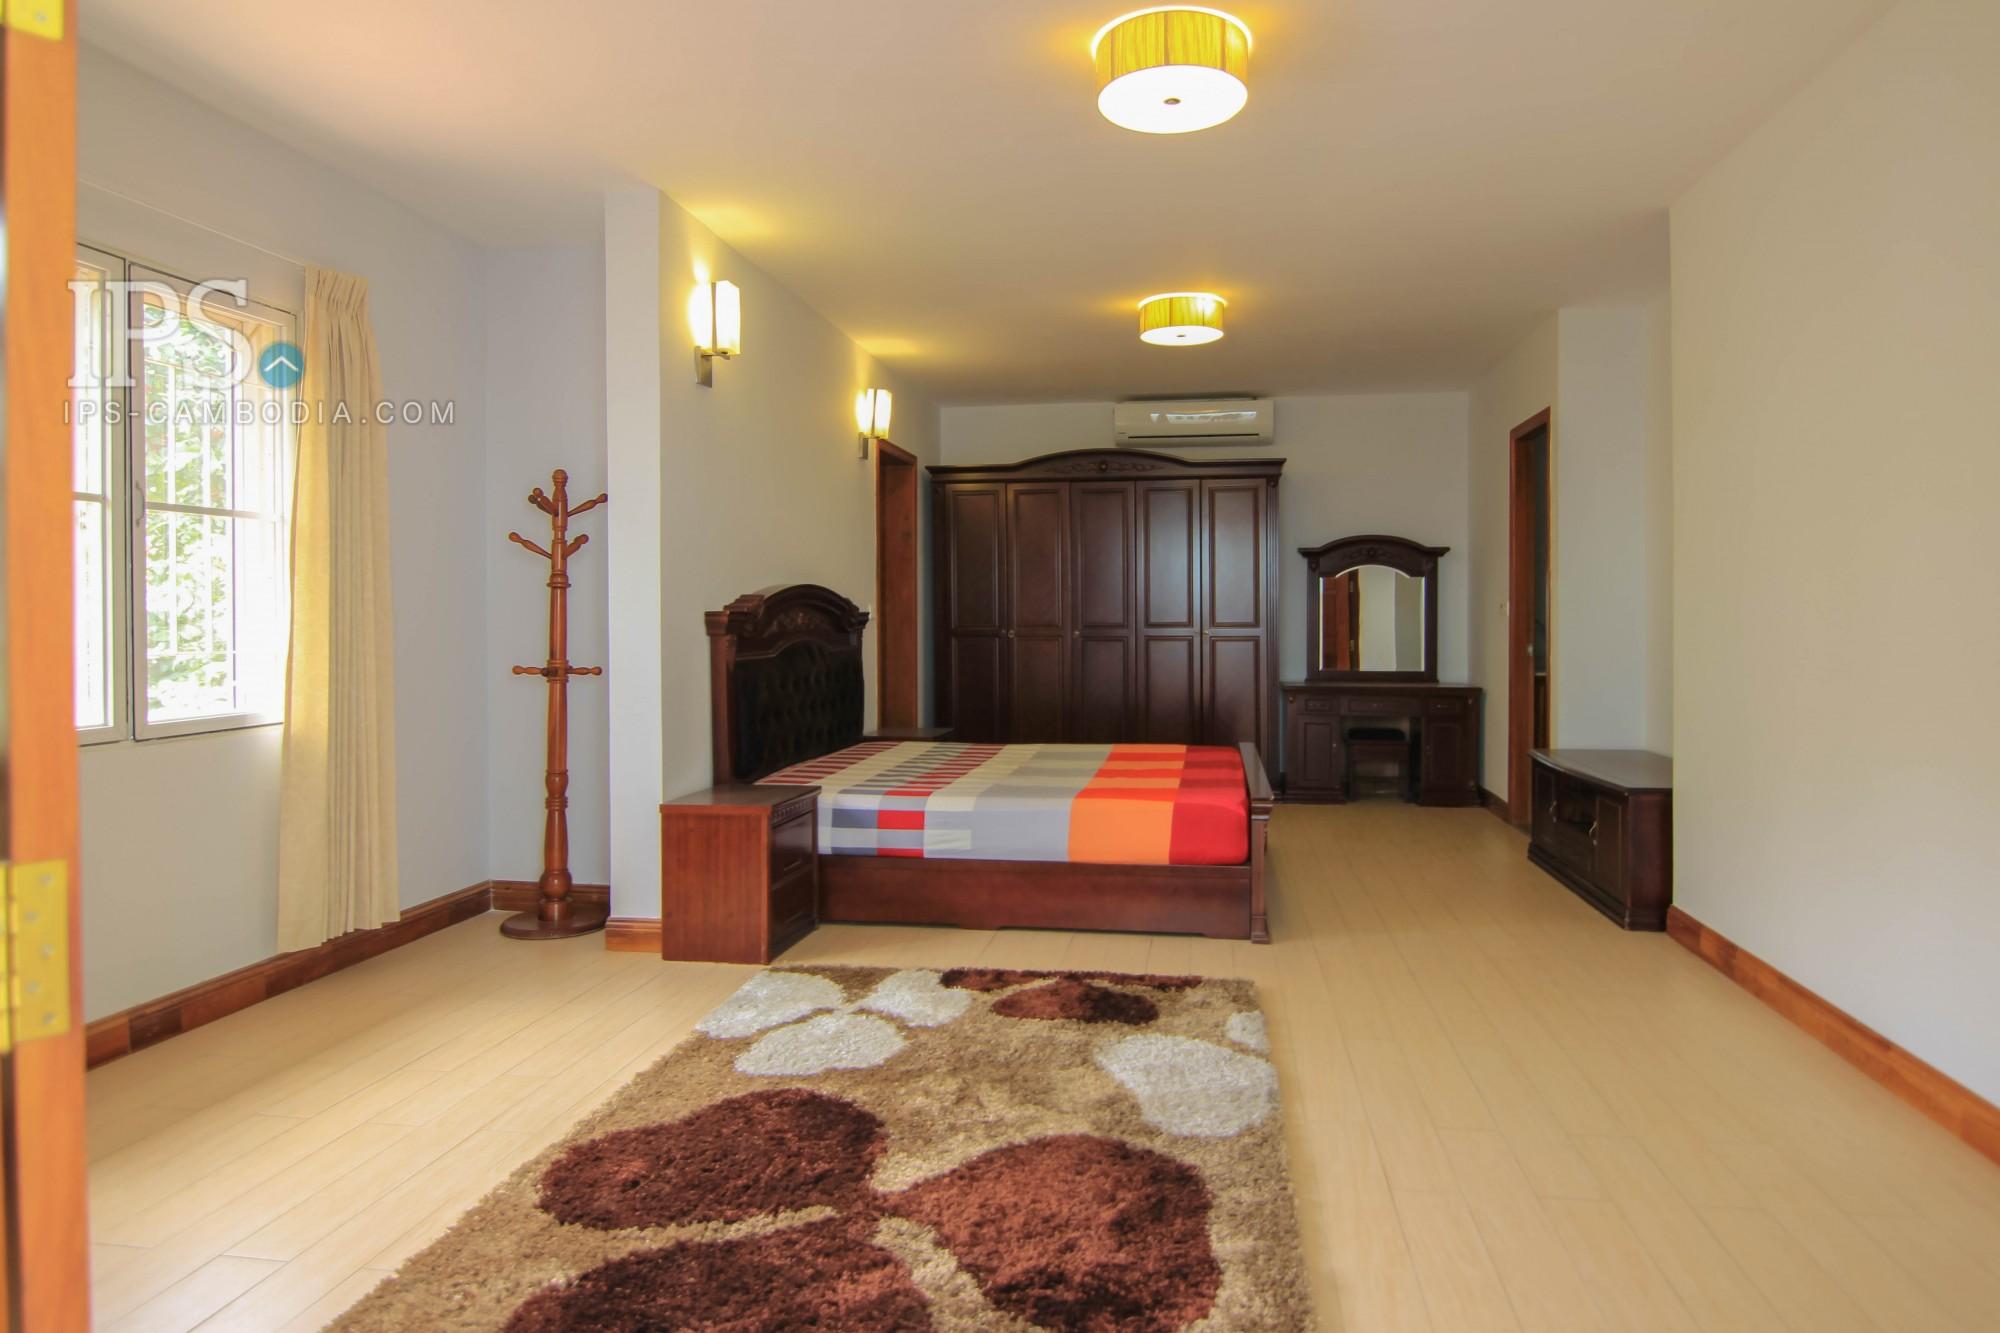 5 Bedroom Villa For Rent - Toul Svay Prey